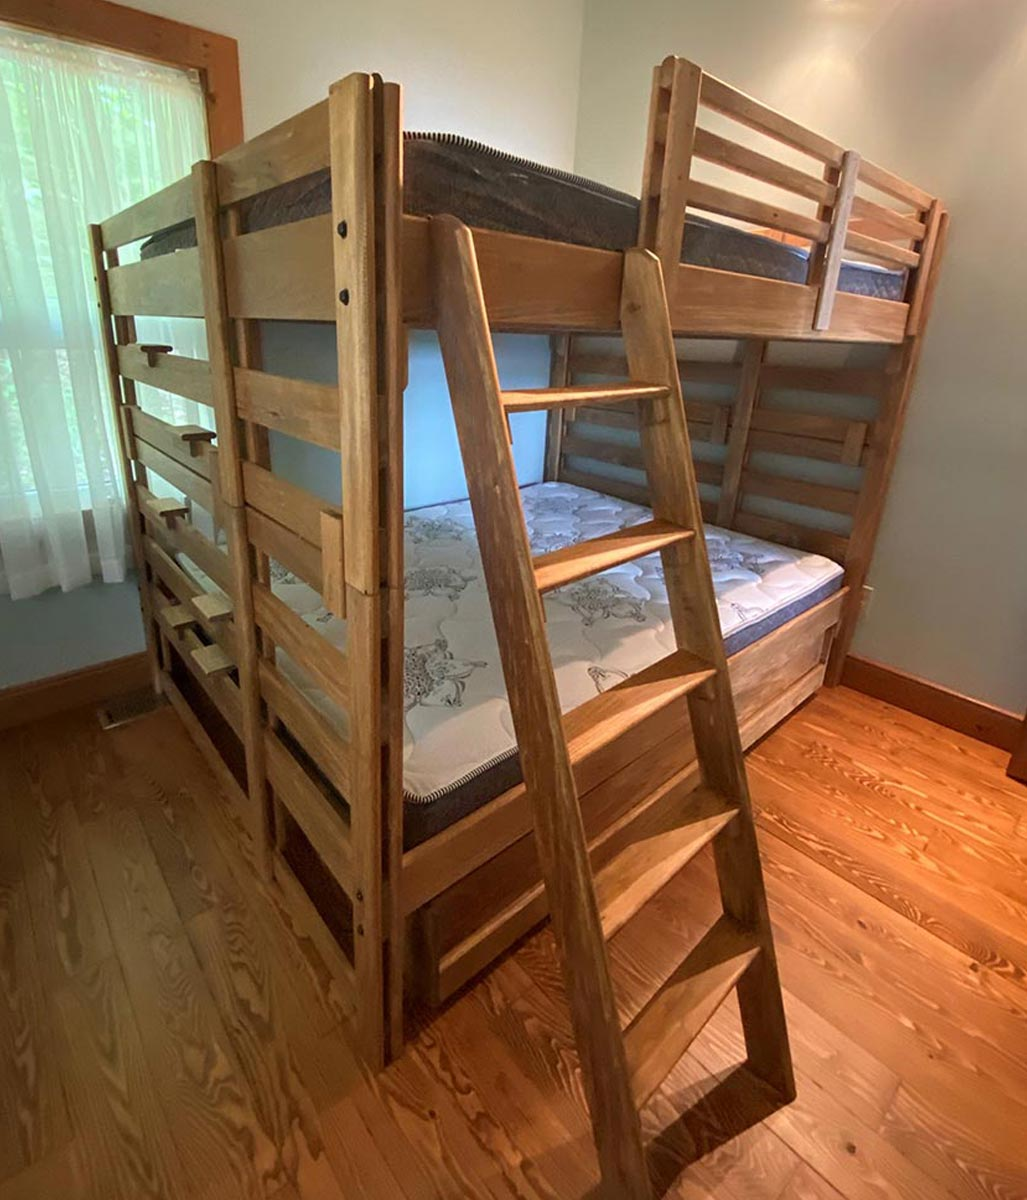 Queen Top / Queen Bottom Bunk Bed with Storage Drawer